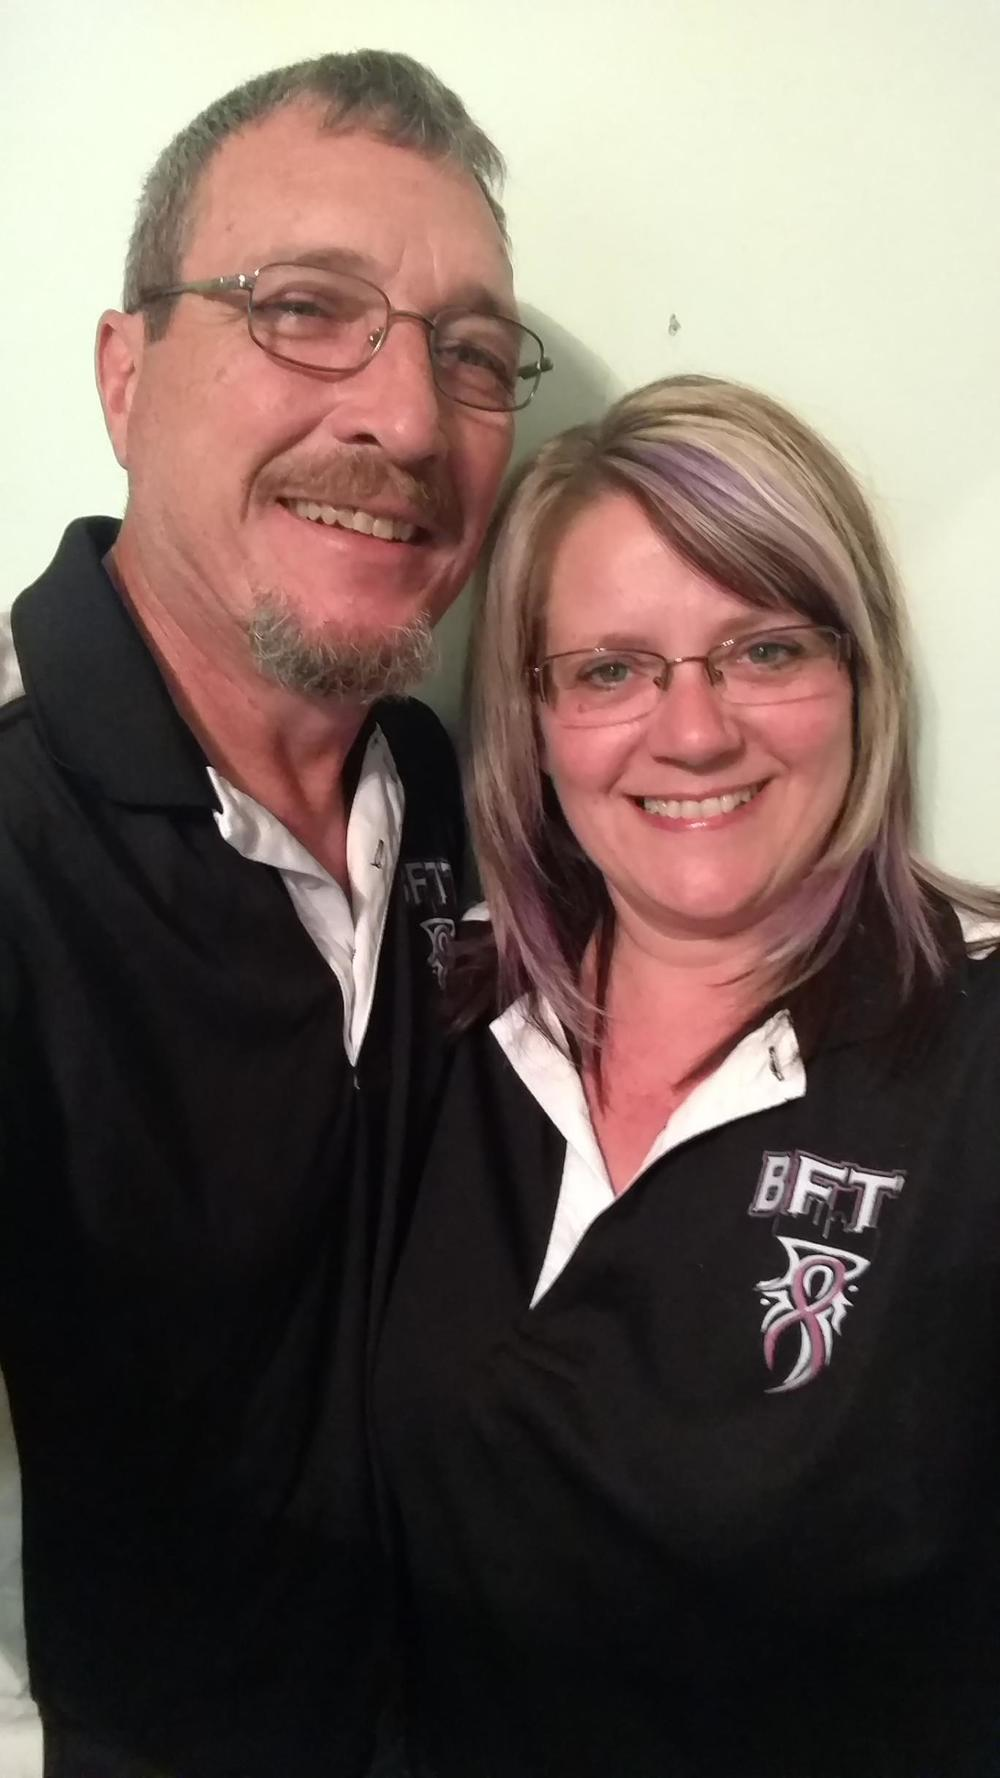 Bryan & Becky Grimes Board Members